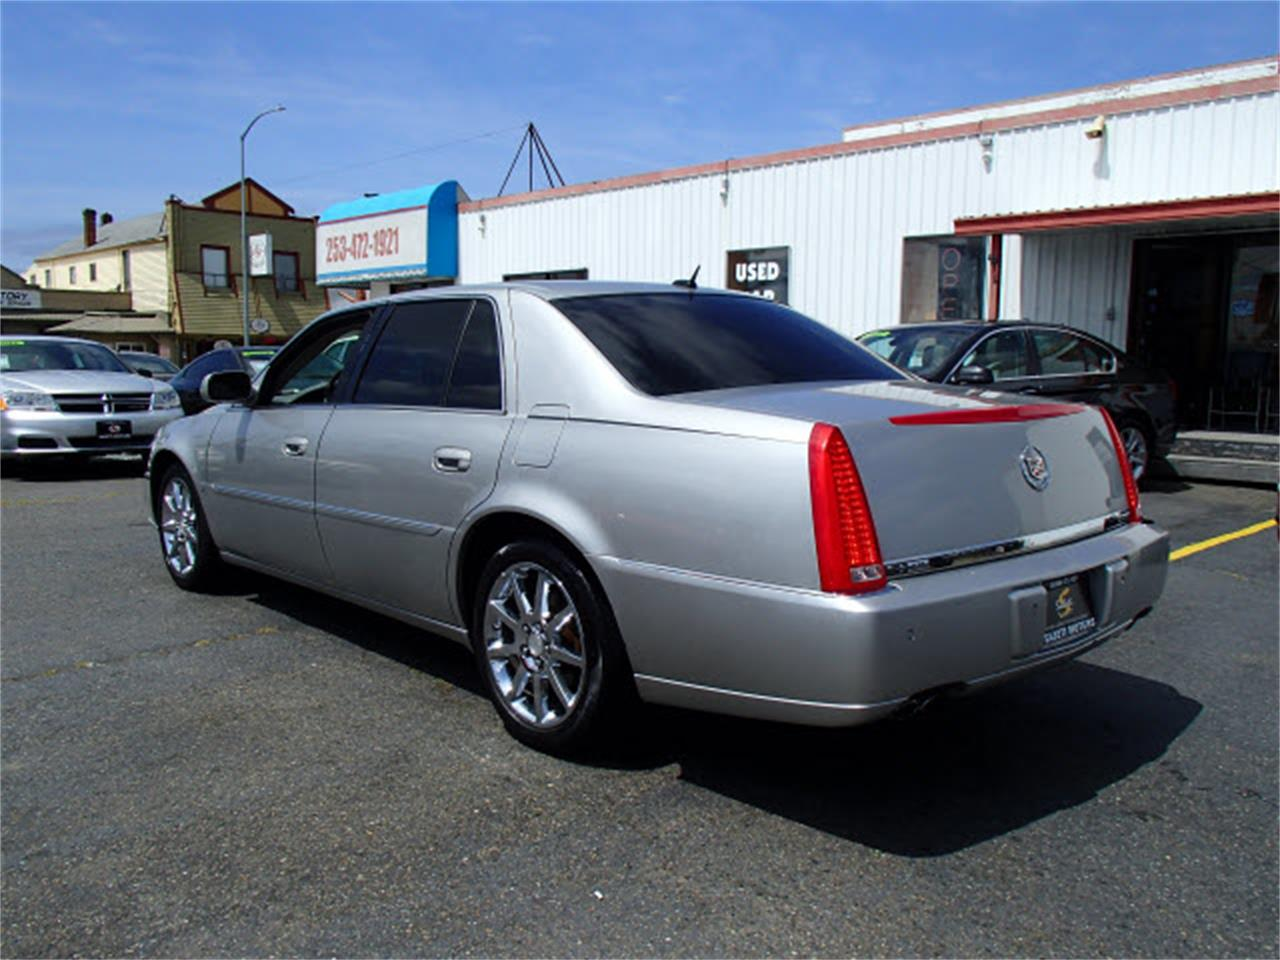 2006 Cadillac DTS for Sale   ClassicCars.com   CC-1174911